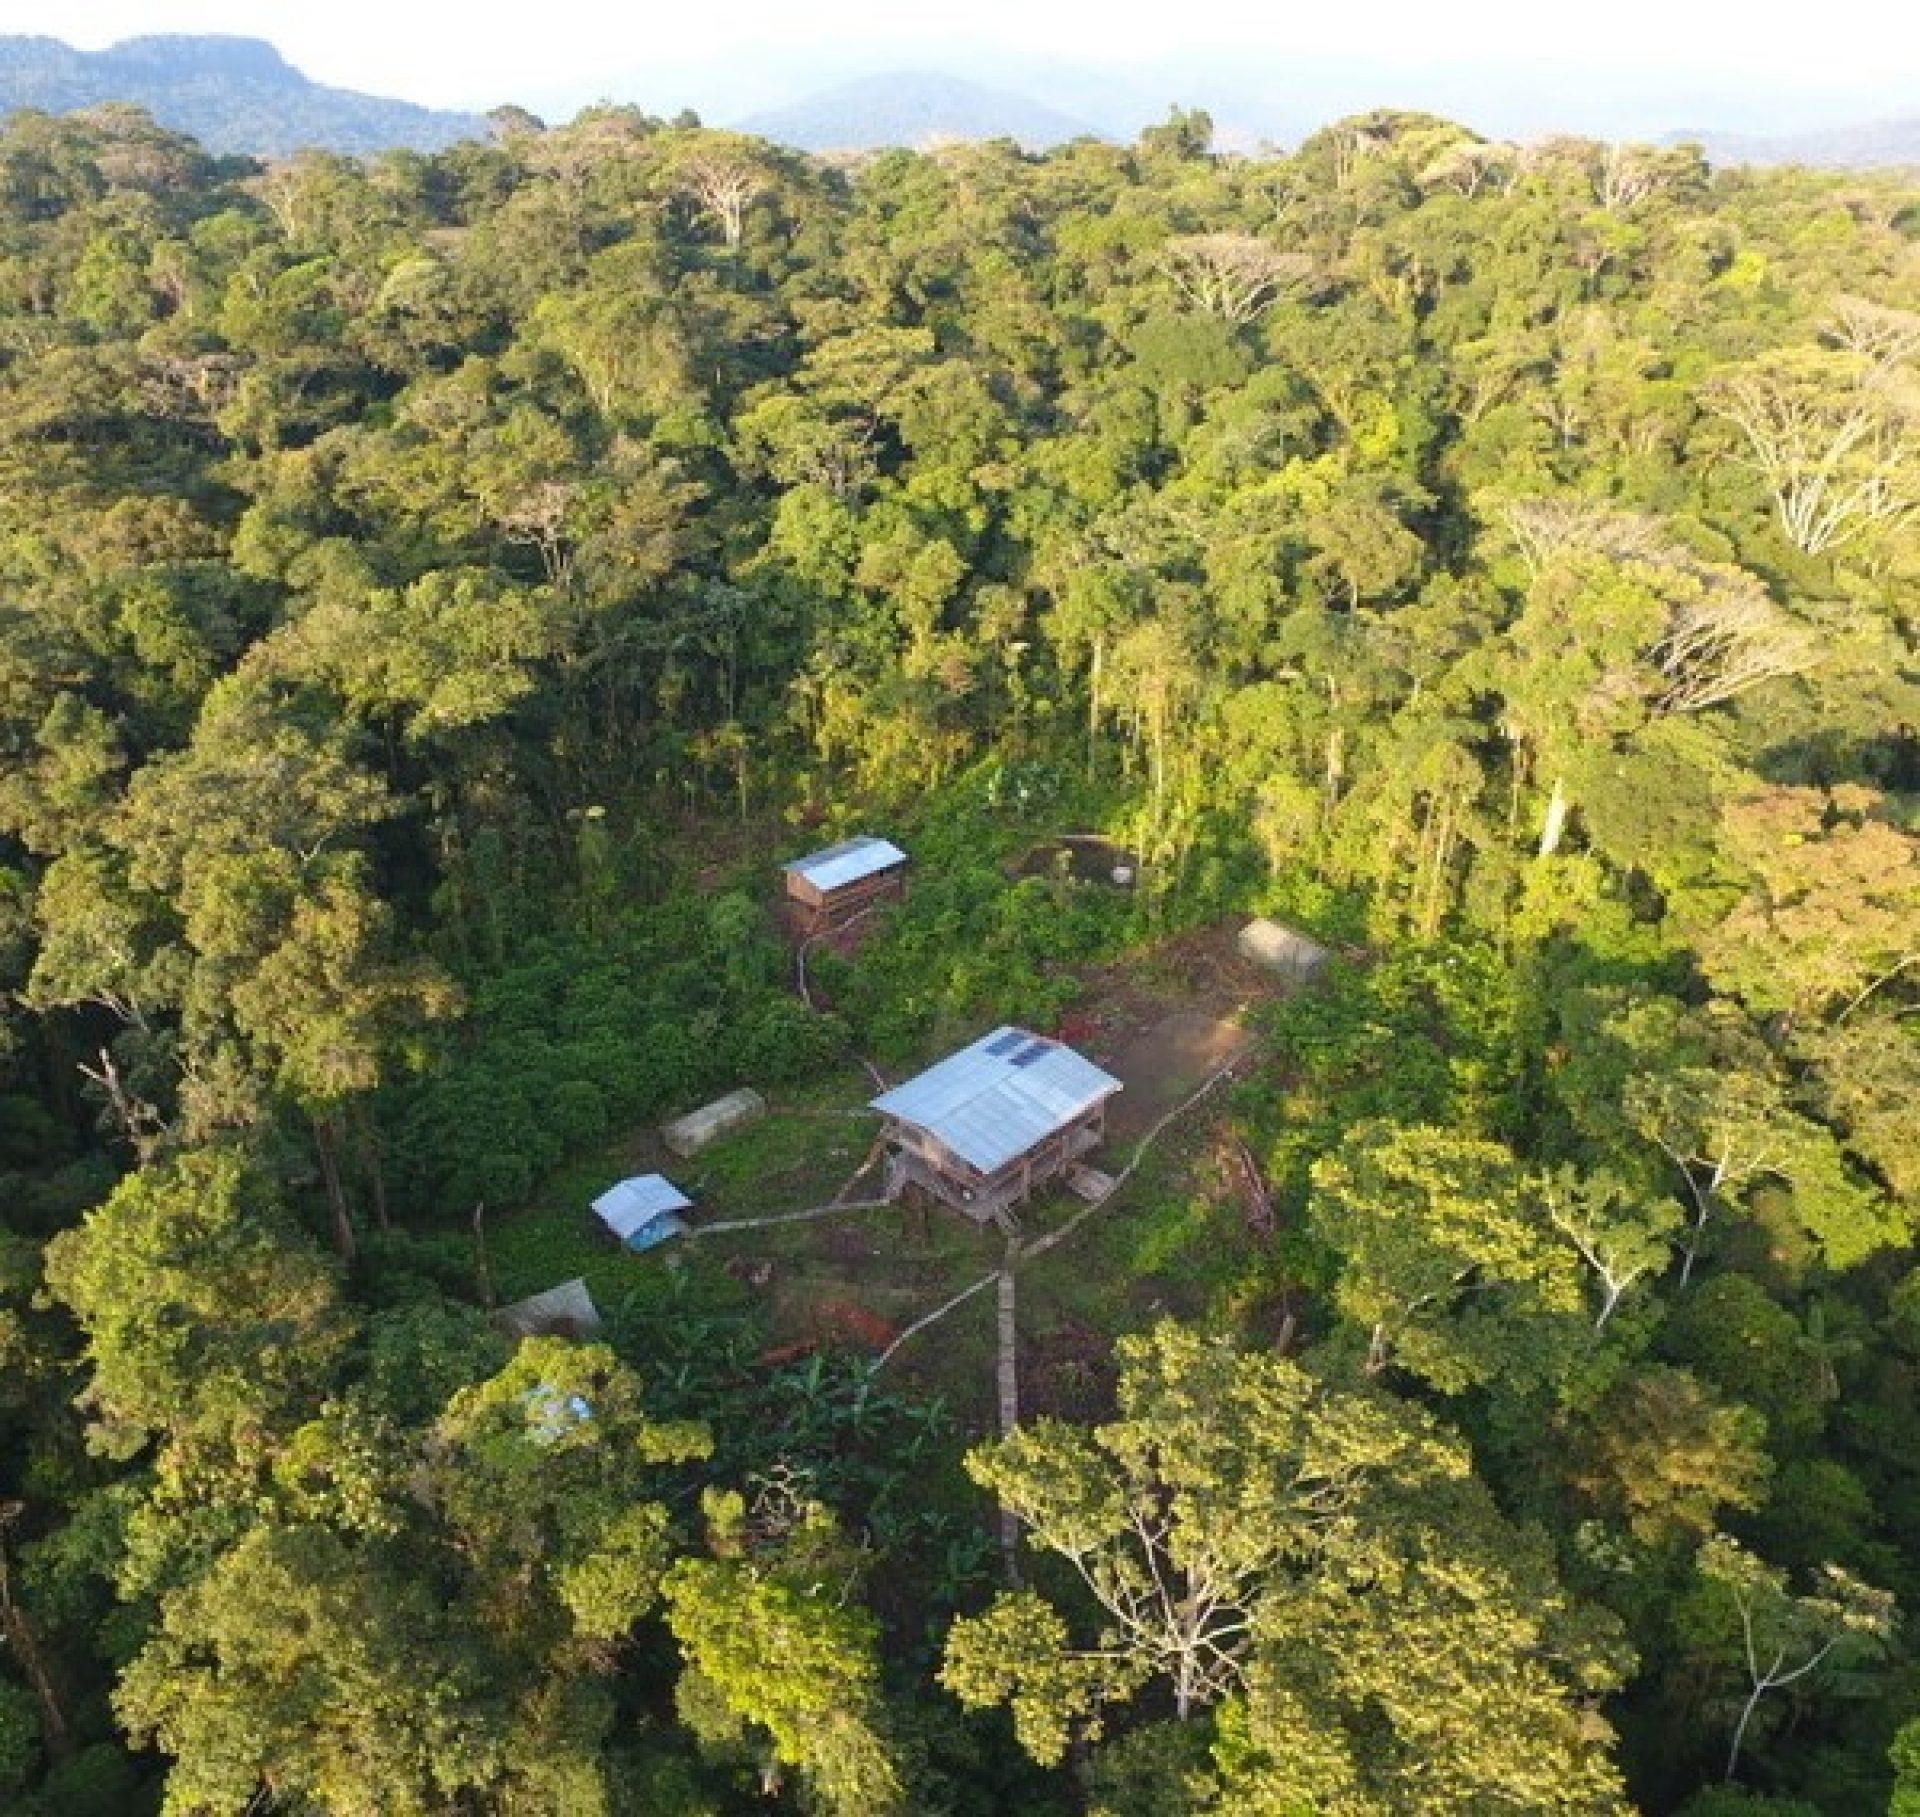 N.R. La Isla Escondida